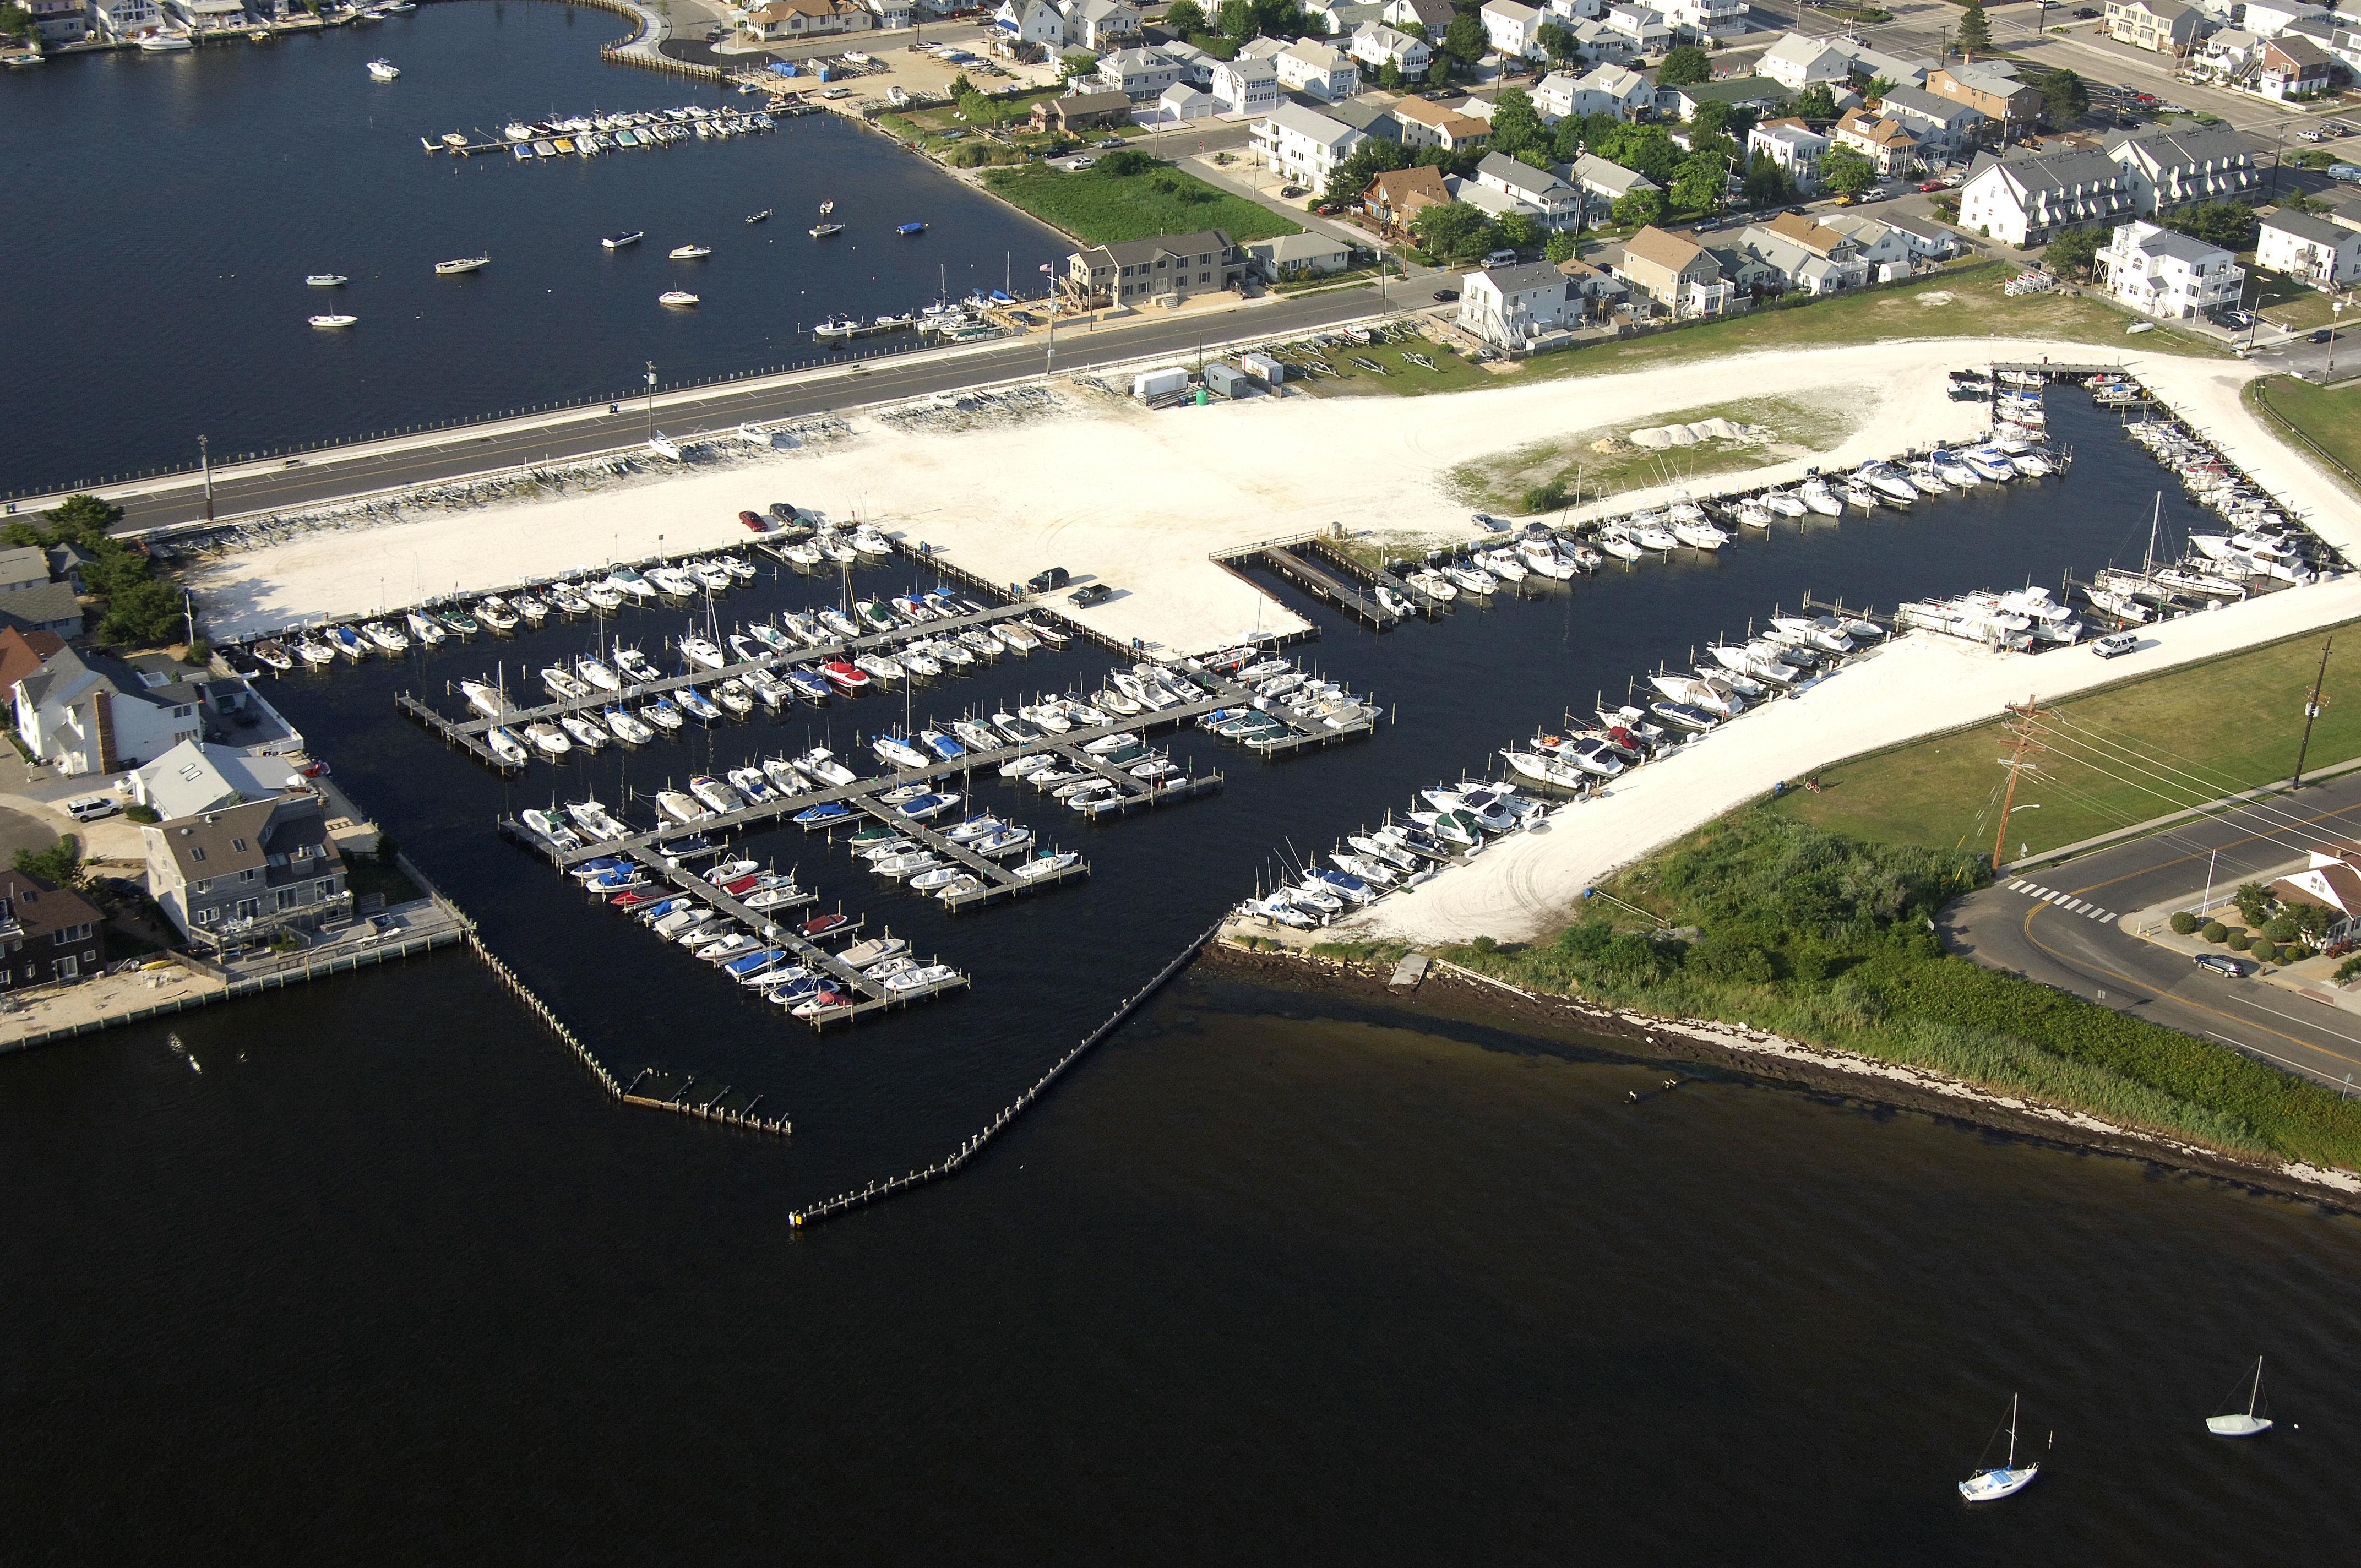 Seaside Park Marina In Seaside Park Nj United States Marina Reviews Phone Number Marinas Com